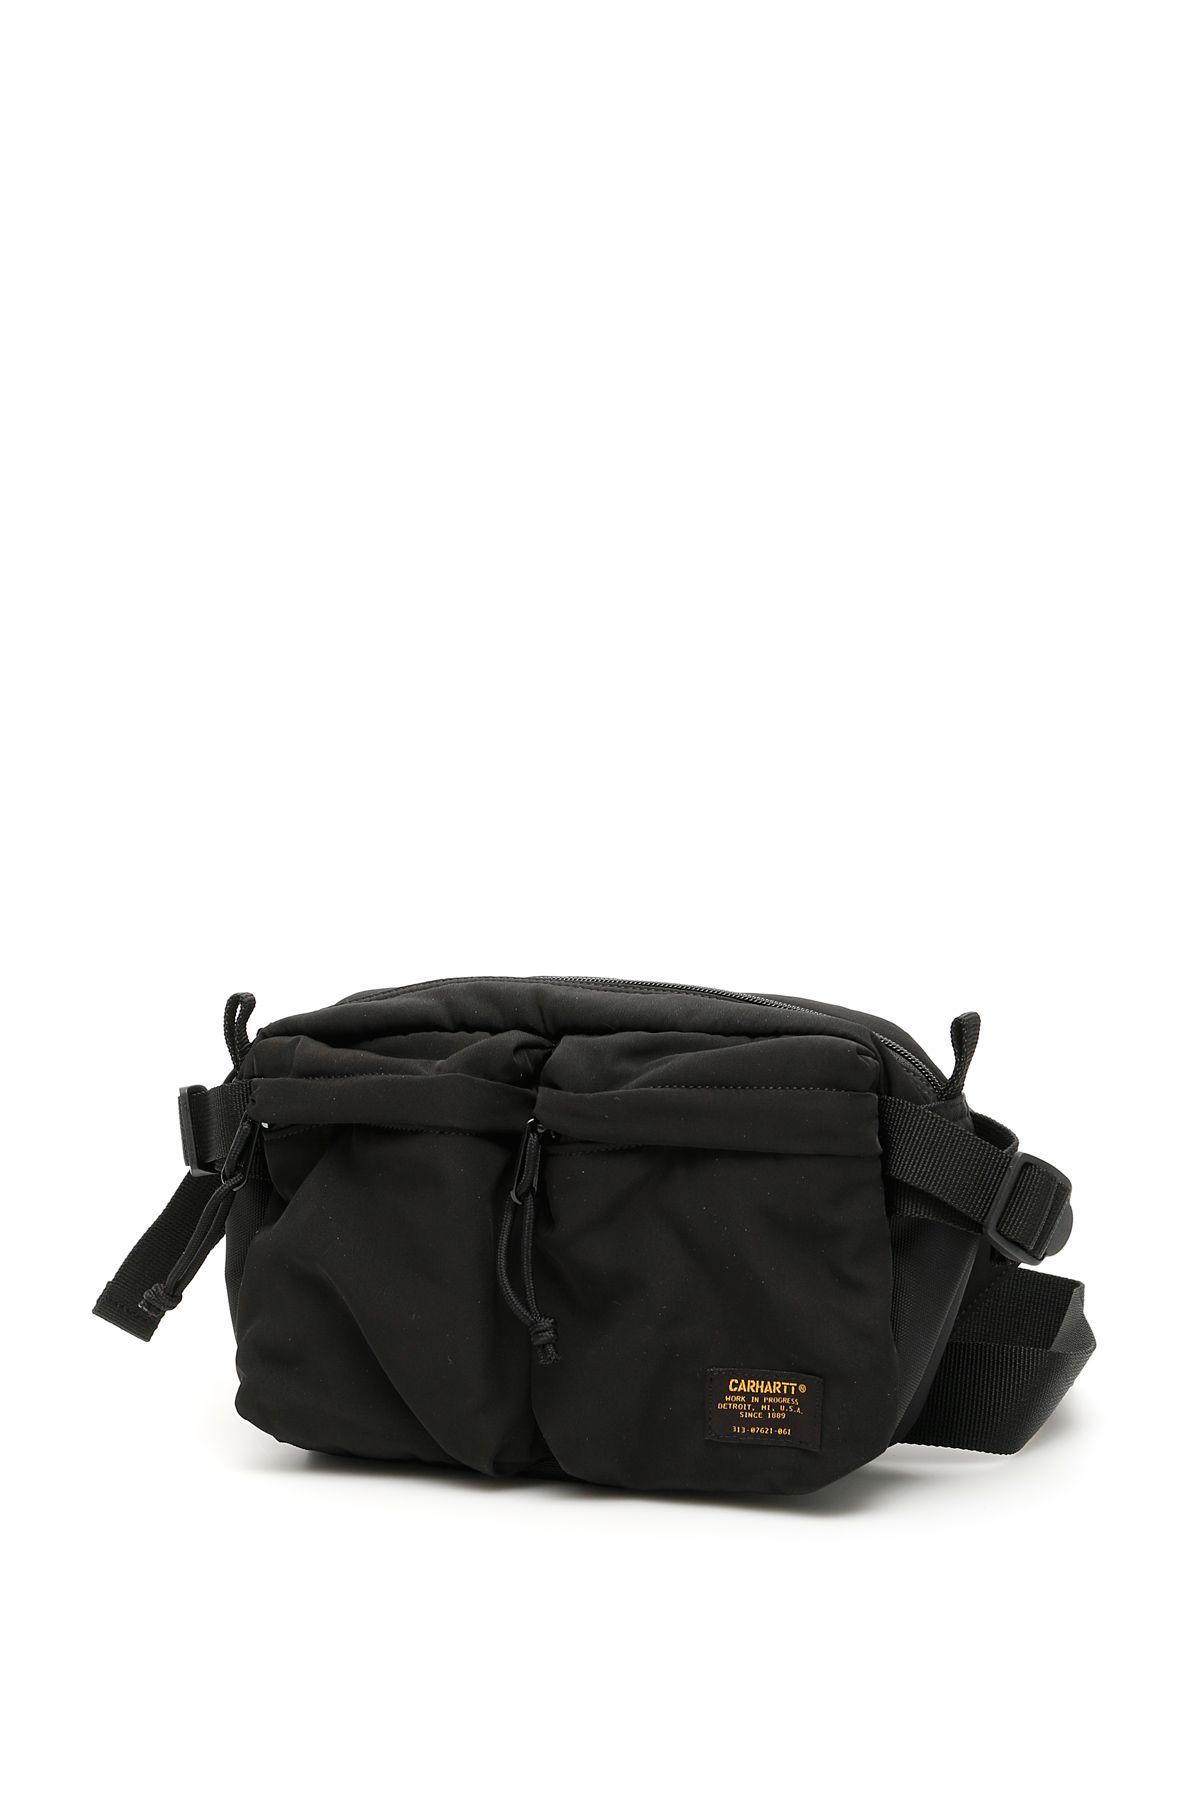 7c98493172 Carhartt Carhartt Military Hip Bag - BLACK (Black) - 10950752 | italist